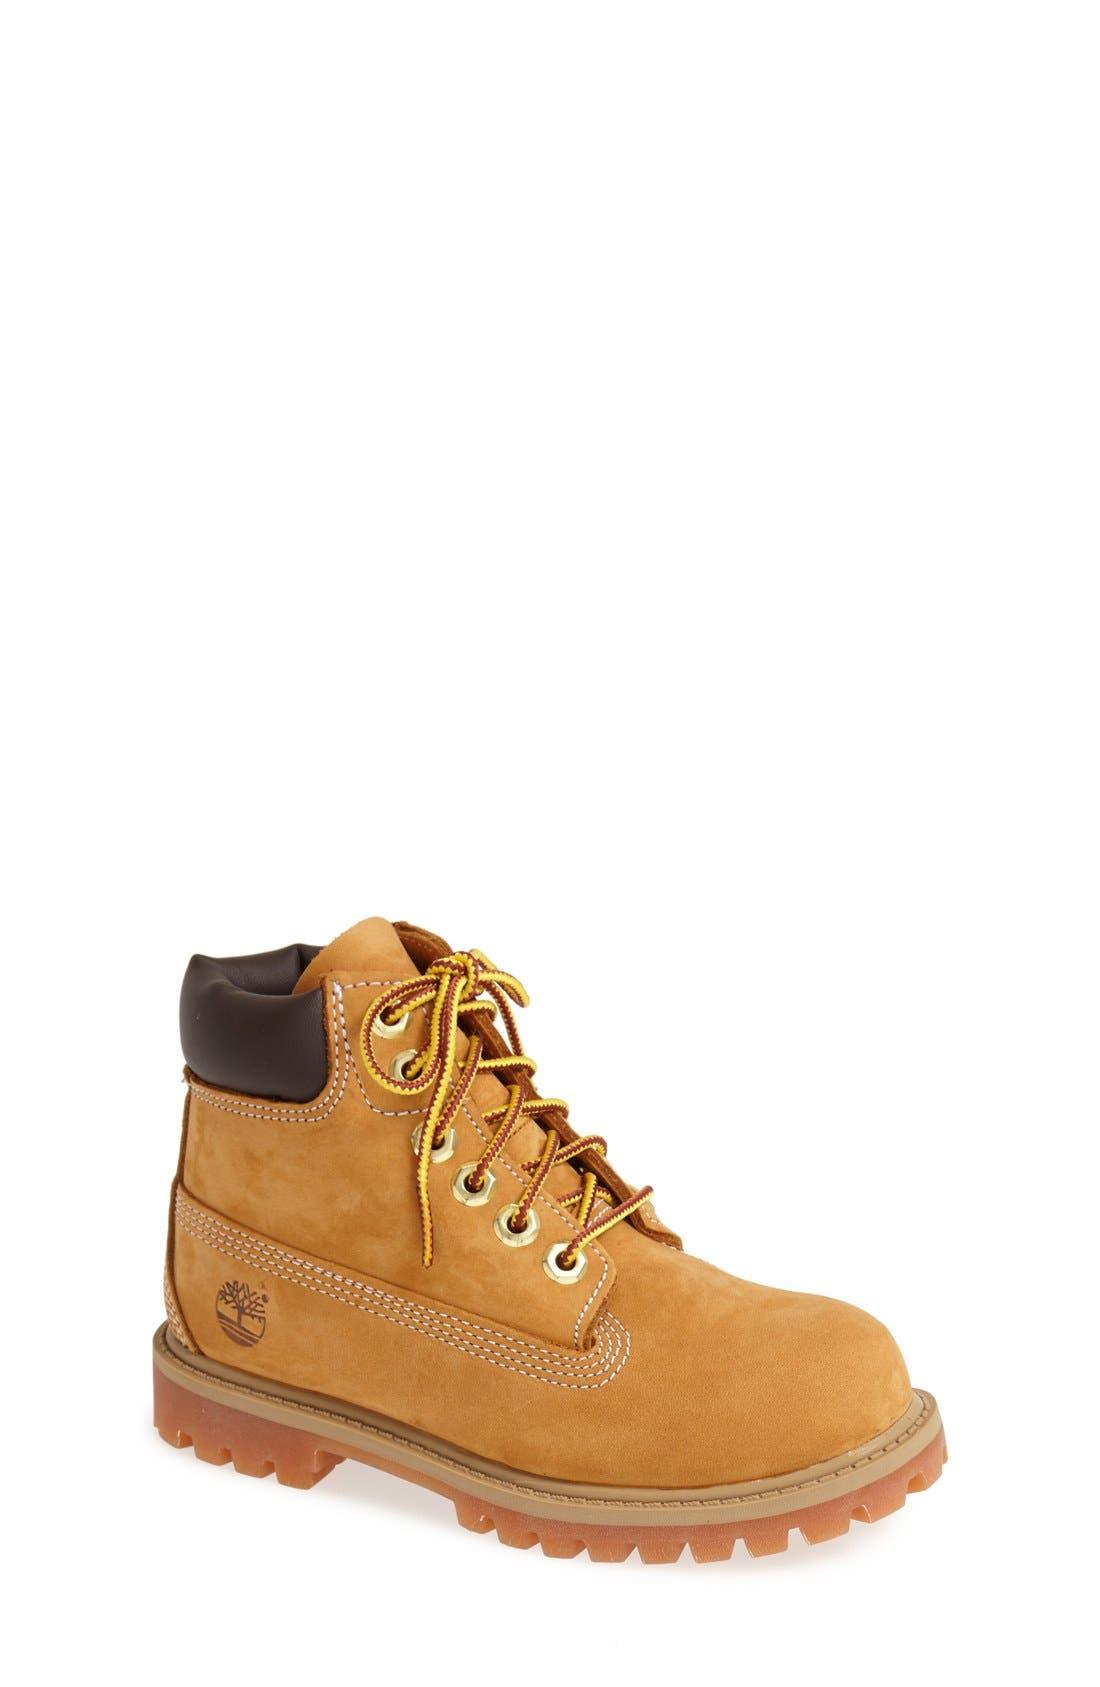 Alternate Image 1 Selected - Timberland '6 Premium' Waterproof Leather Boot (Walker & Toddler)